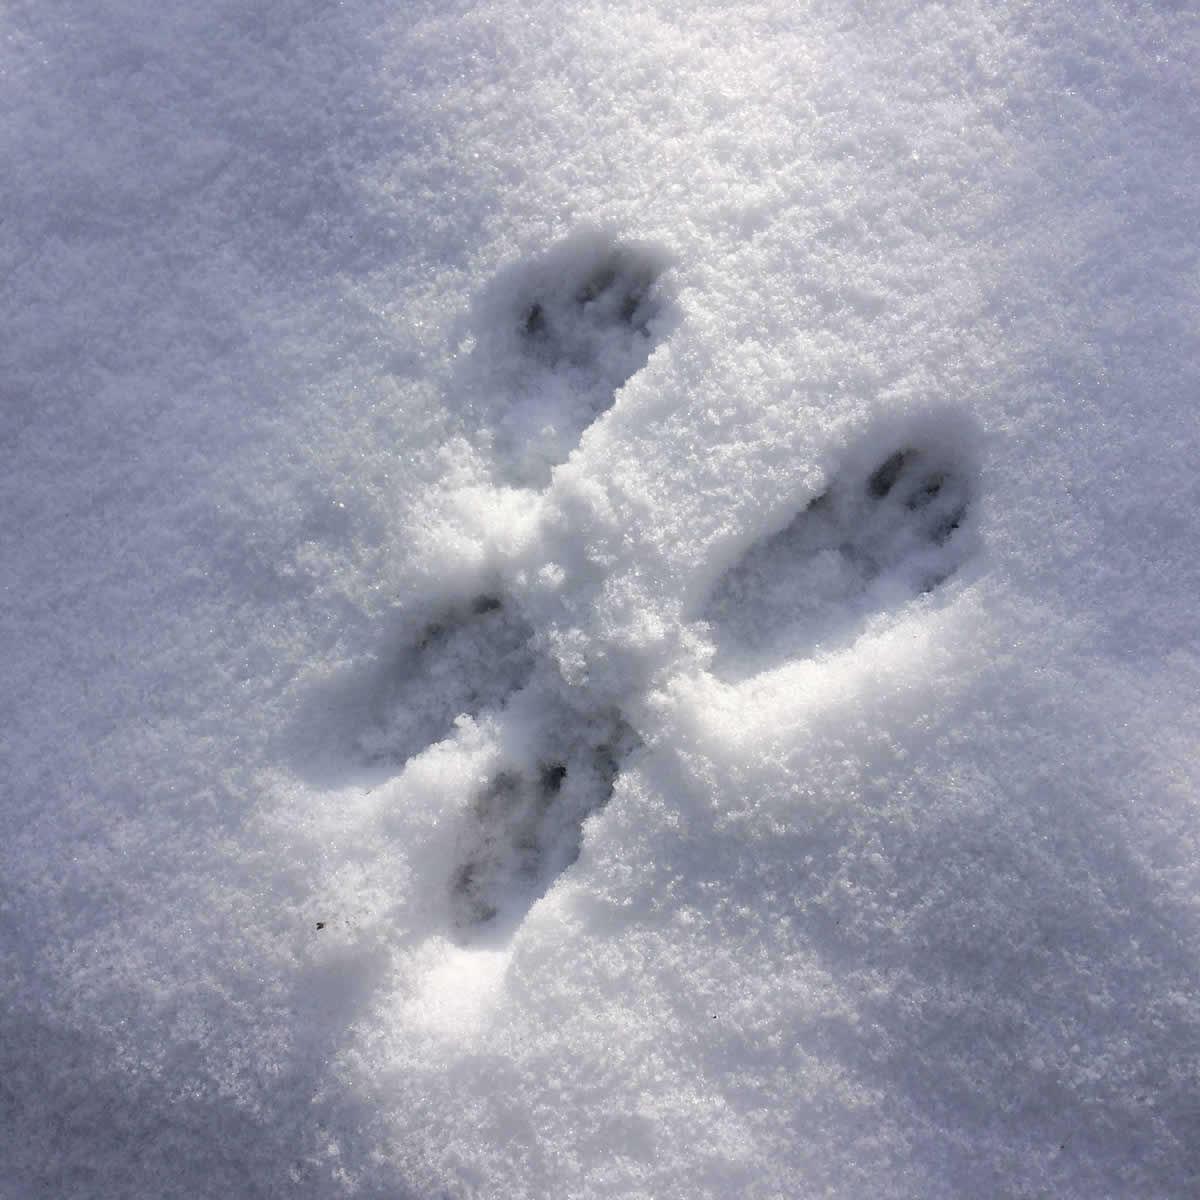 Wild animal foot prints in snow in Zagori, Vikos-Aoos Geopark